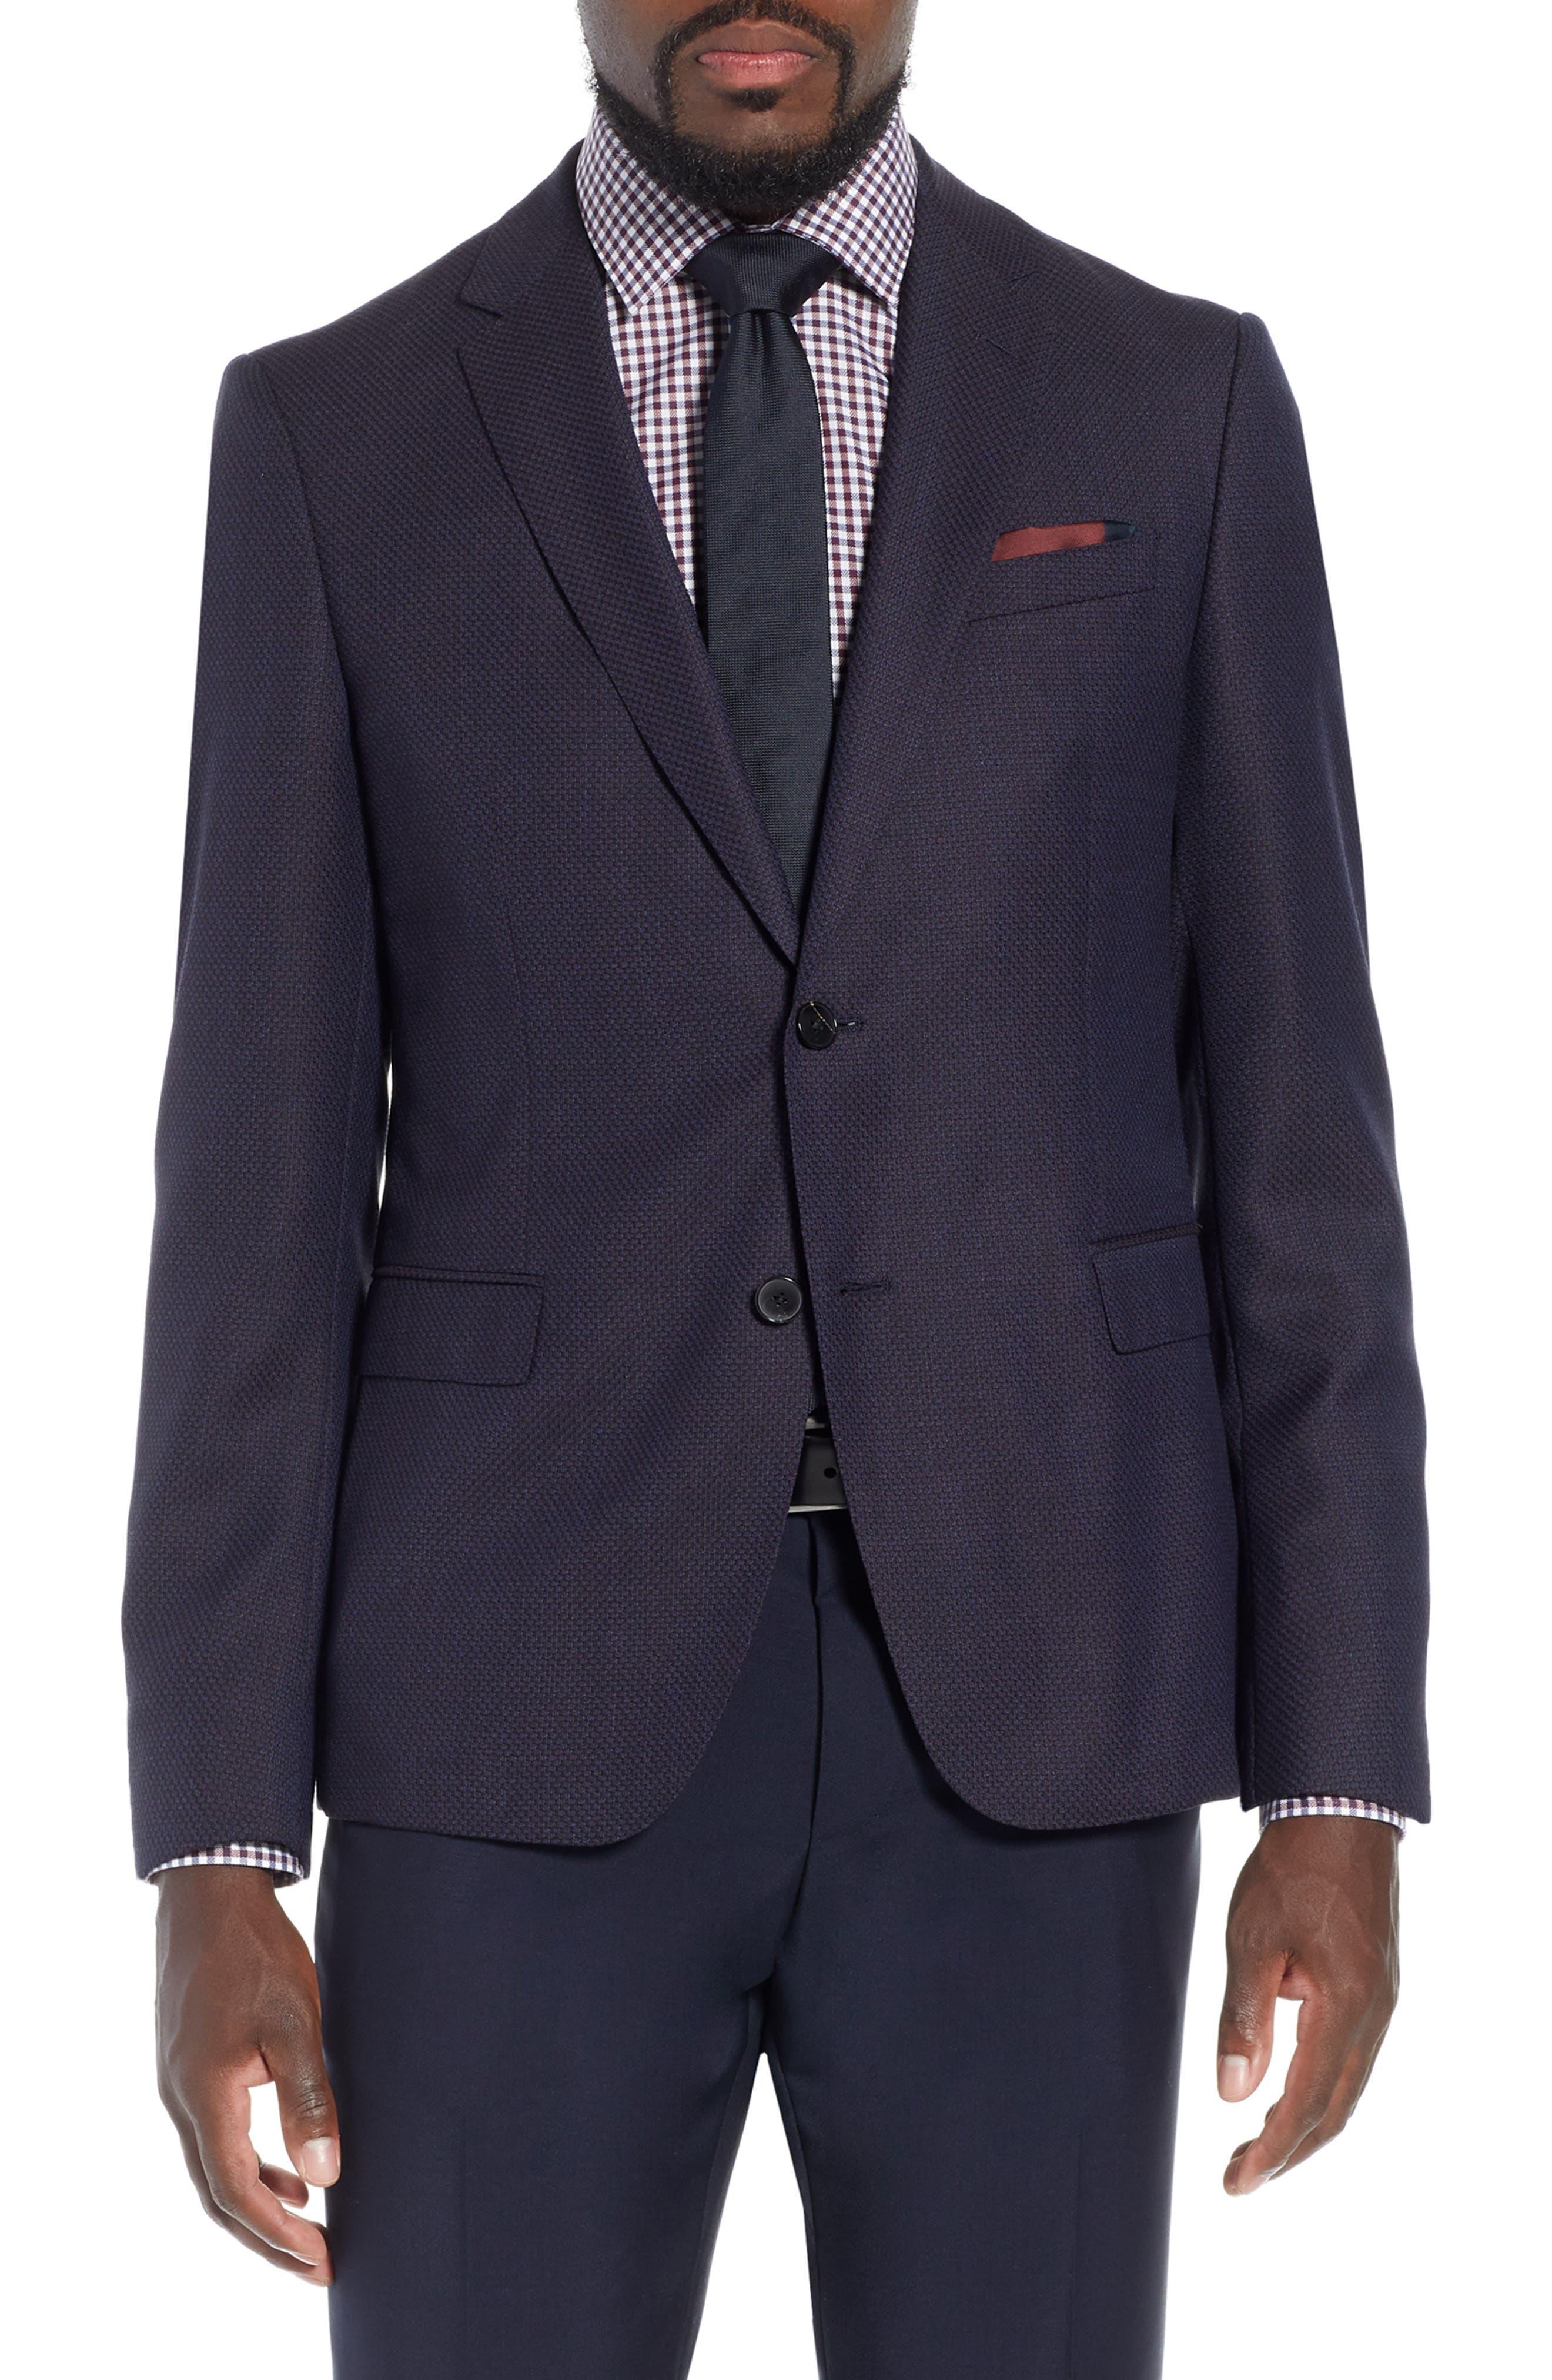 x Nordstrom Nobis Trim Fit Wool Blazer,                         Main,                         color, NAVY